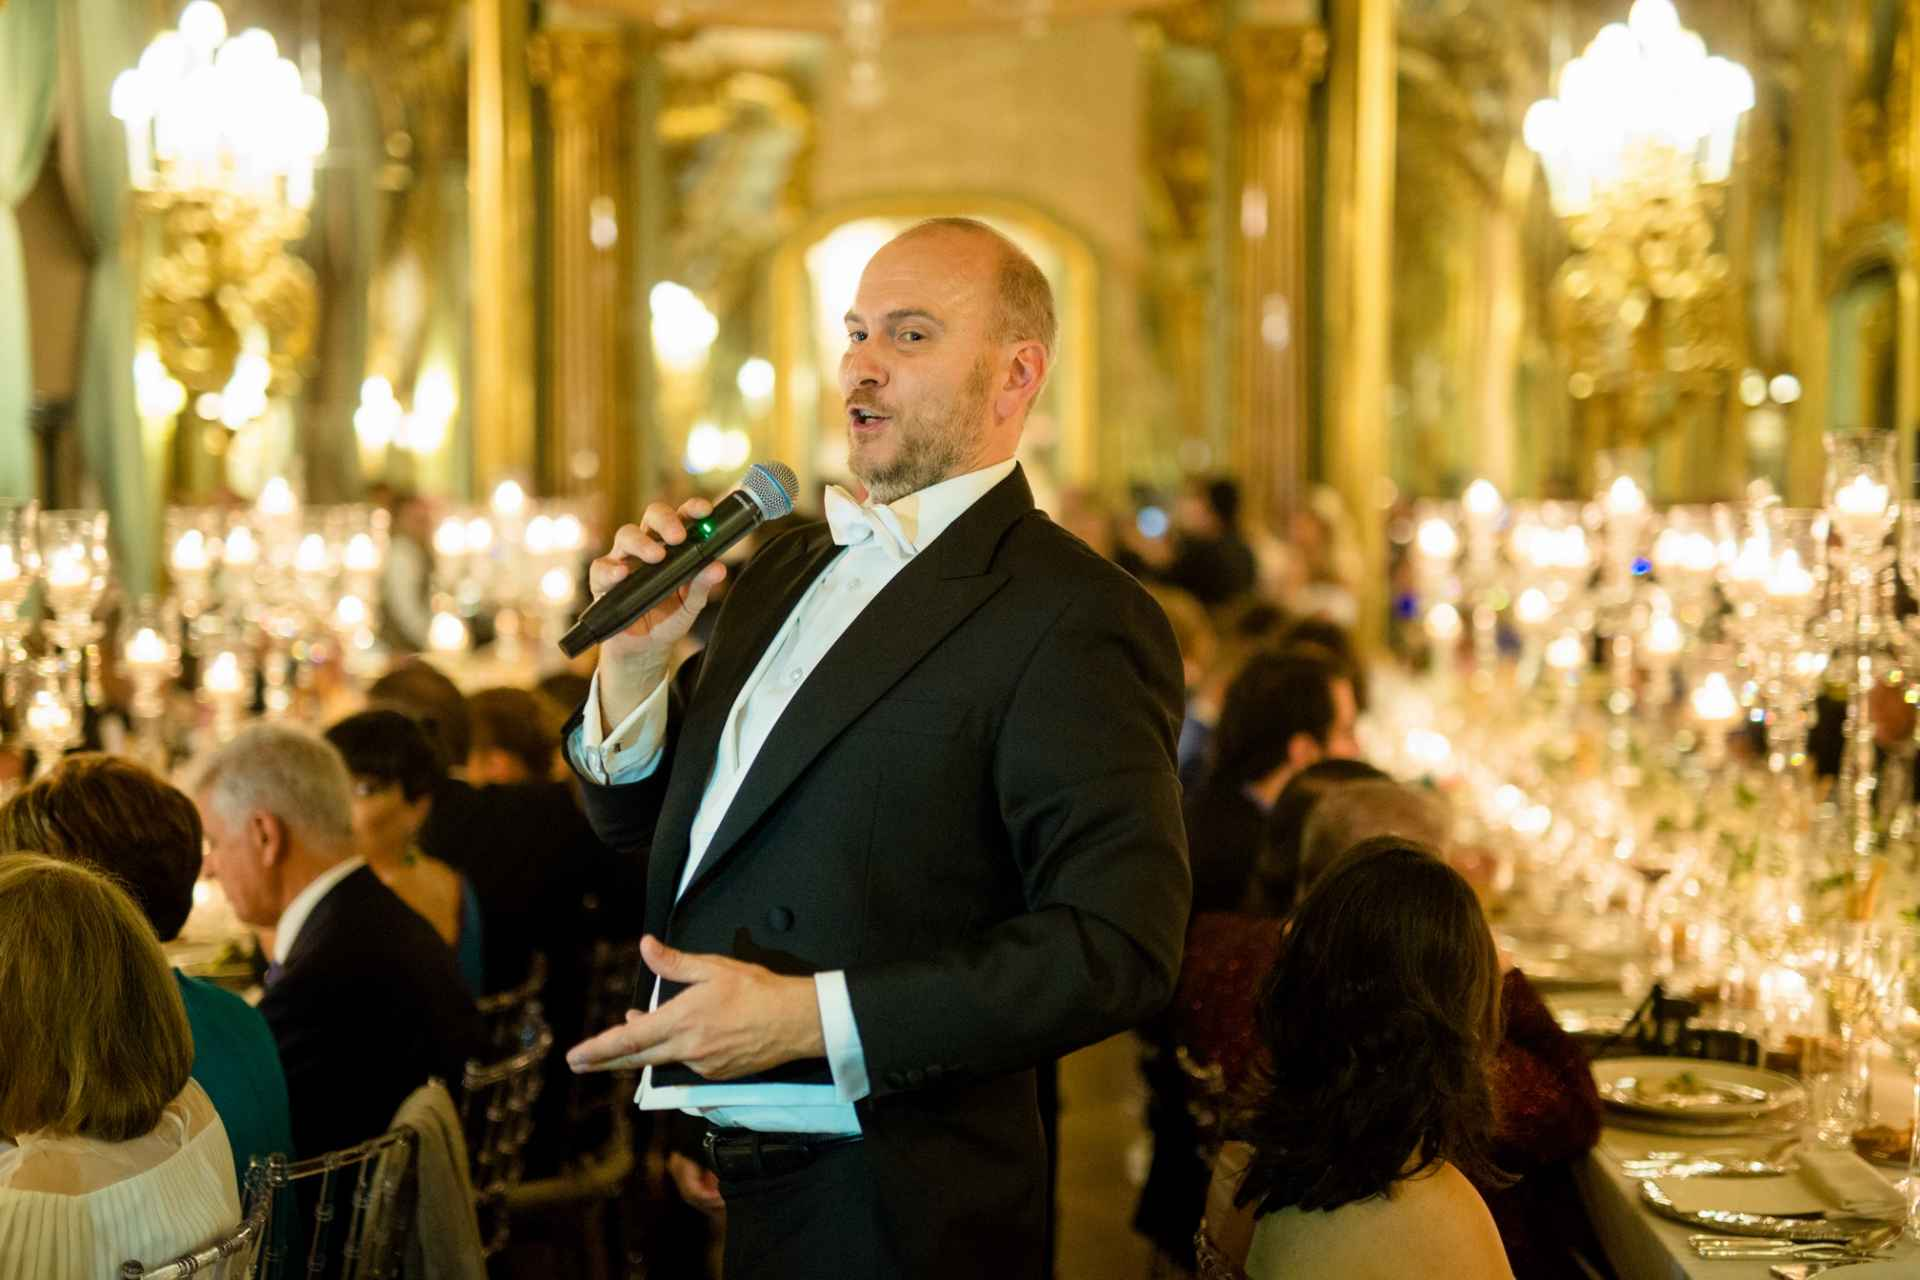 tenore cena kaleydo entertainment classic music performer